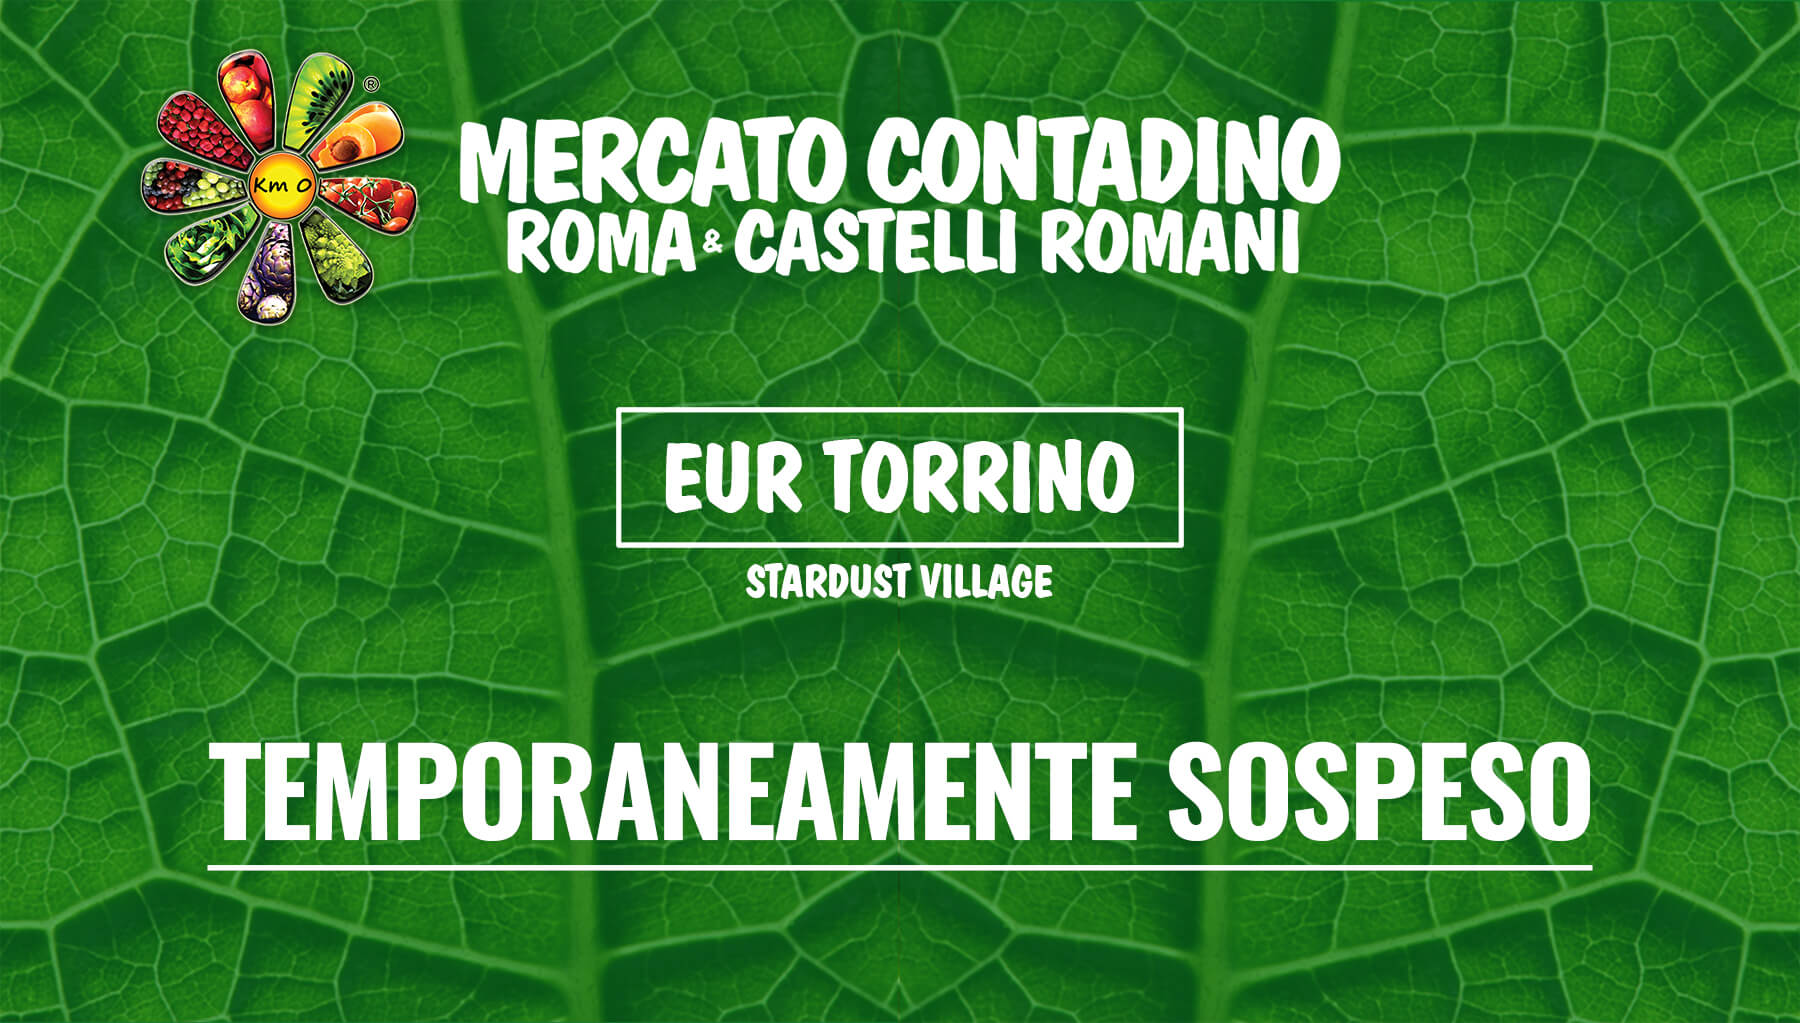 eur_roma_mercato_contadino_sospeso